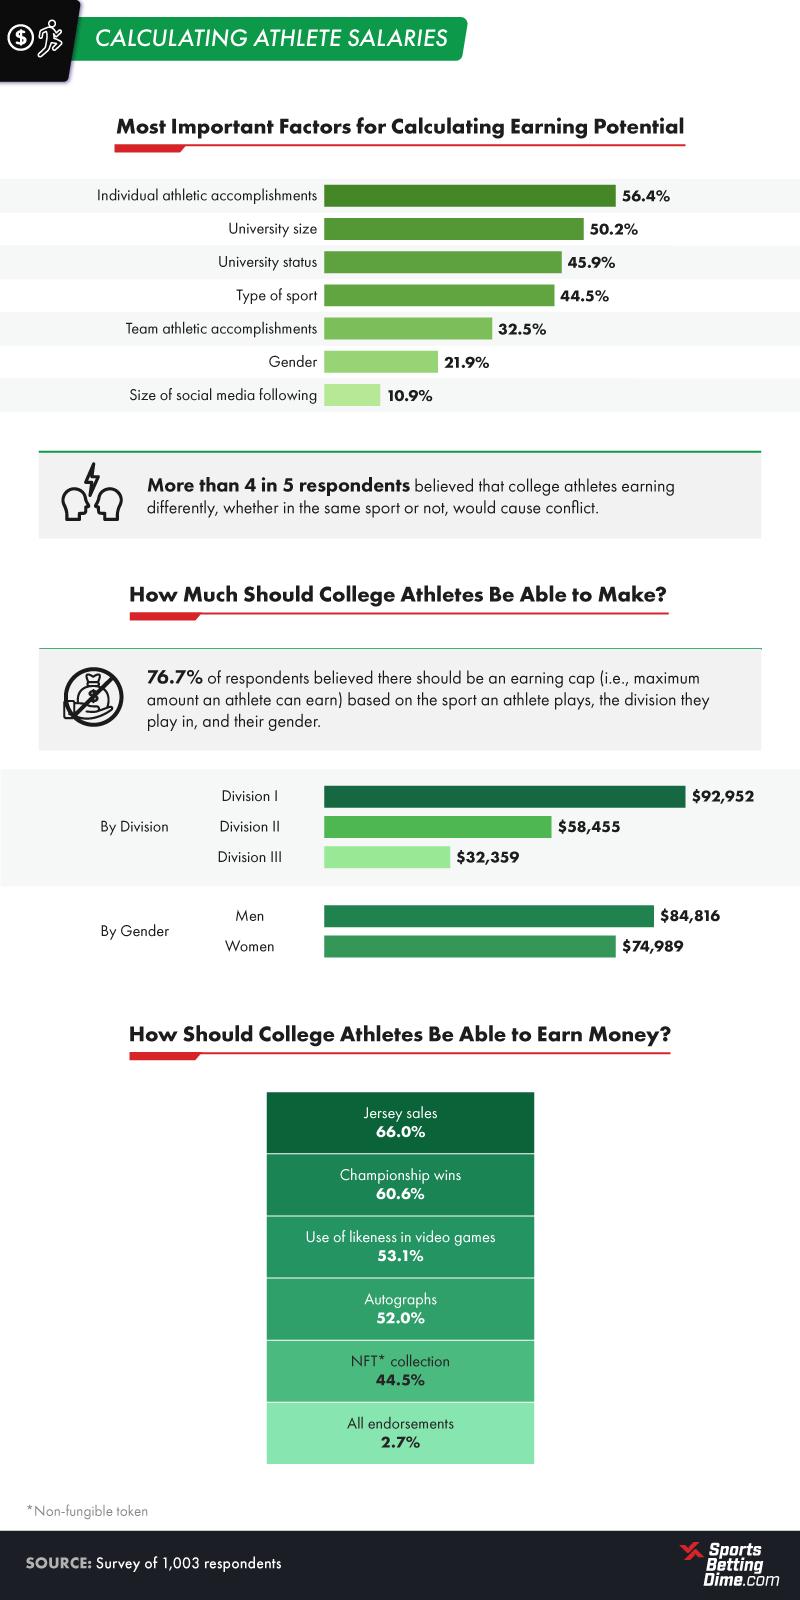 Calculating Athlete Salary